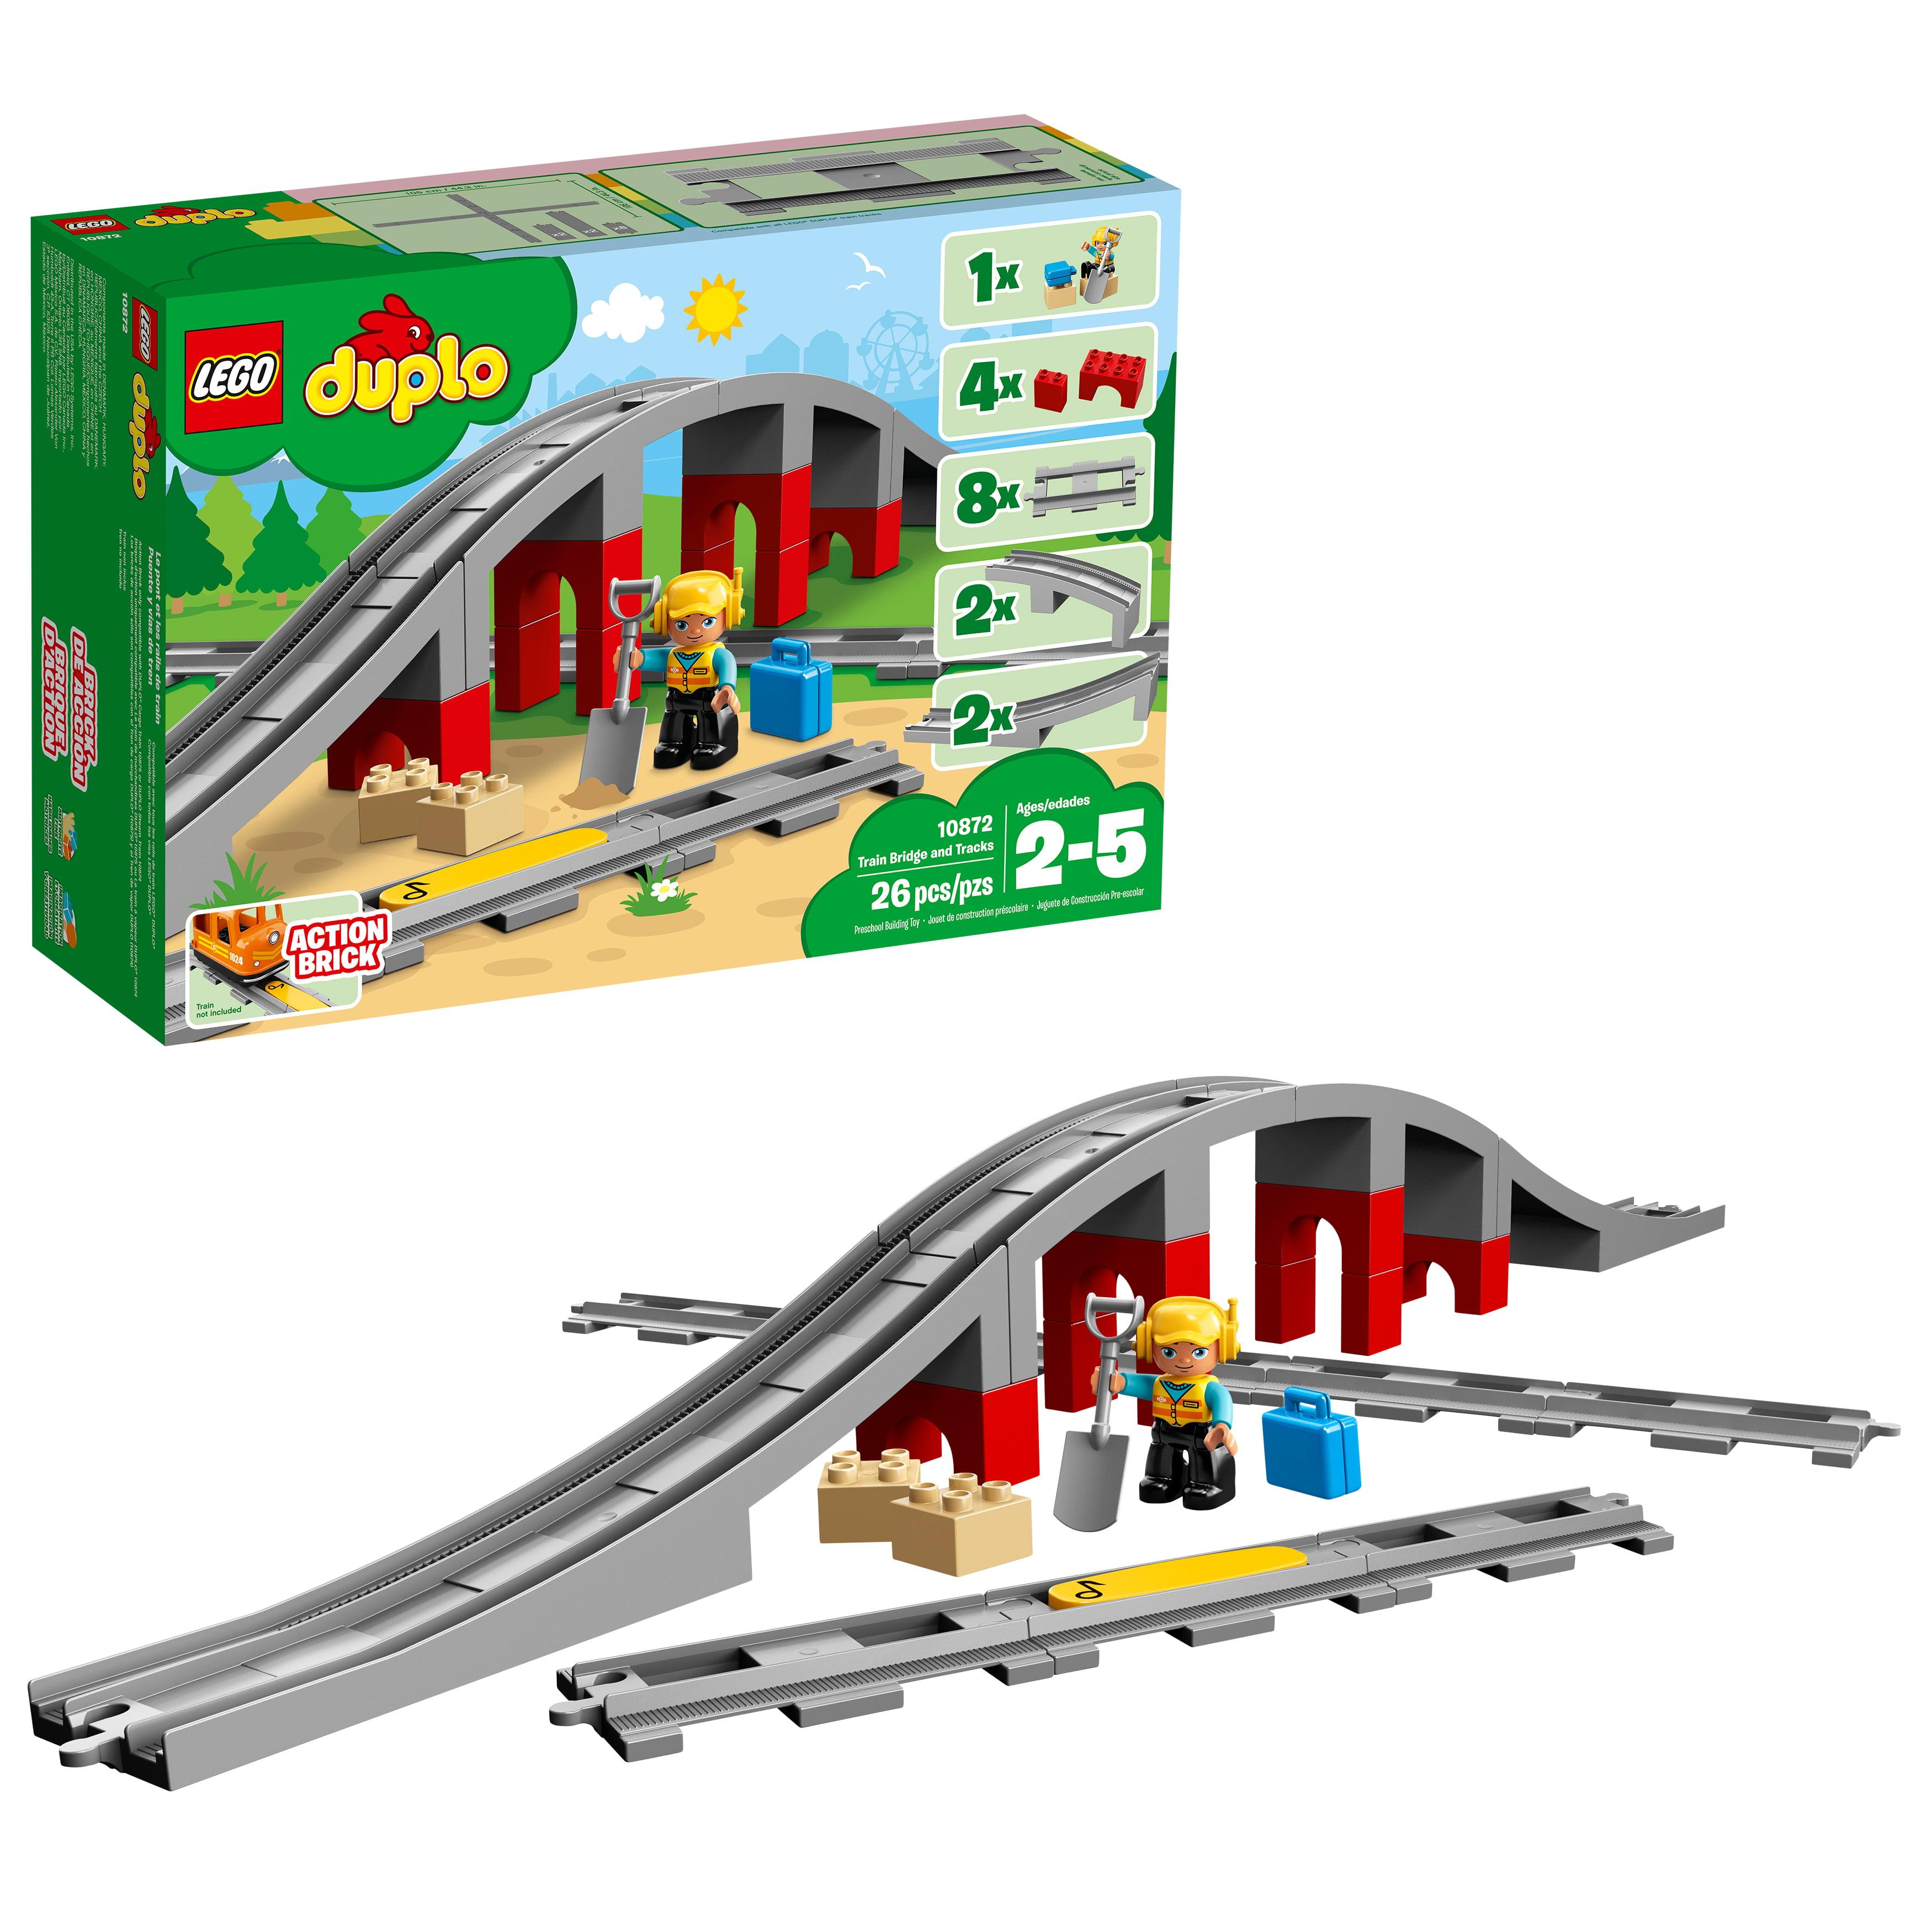 Lego Duplo Town Train Bridge And Tracks Nbsp 10872 Nbsp 26 Pieces Walmart Com Walmart Com